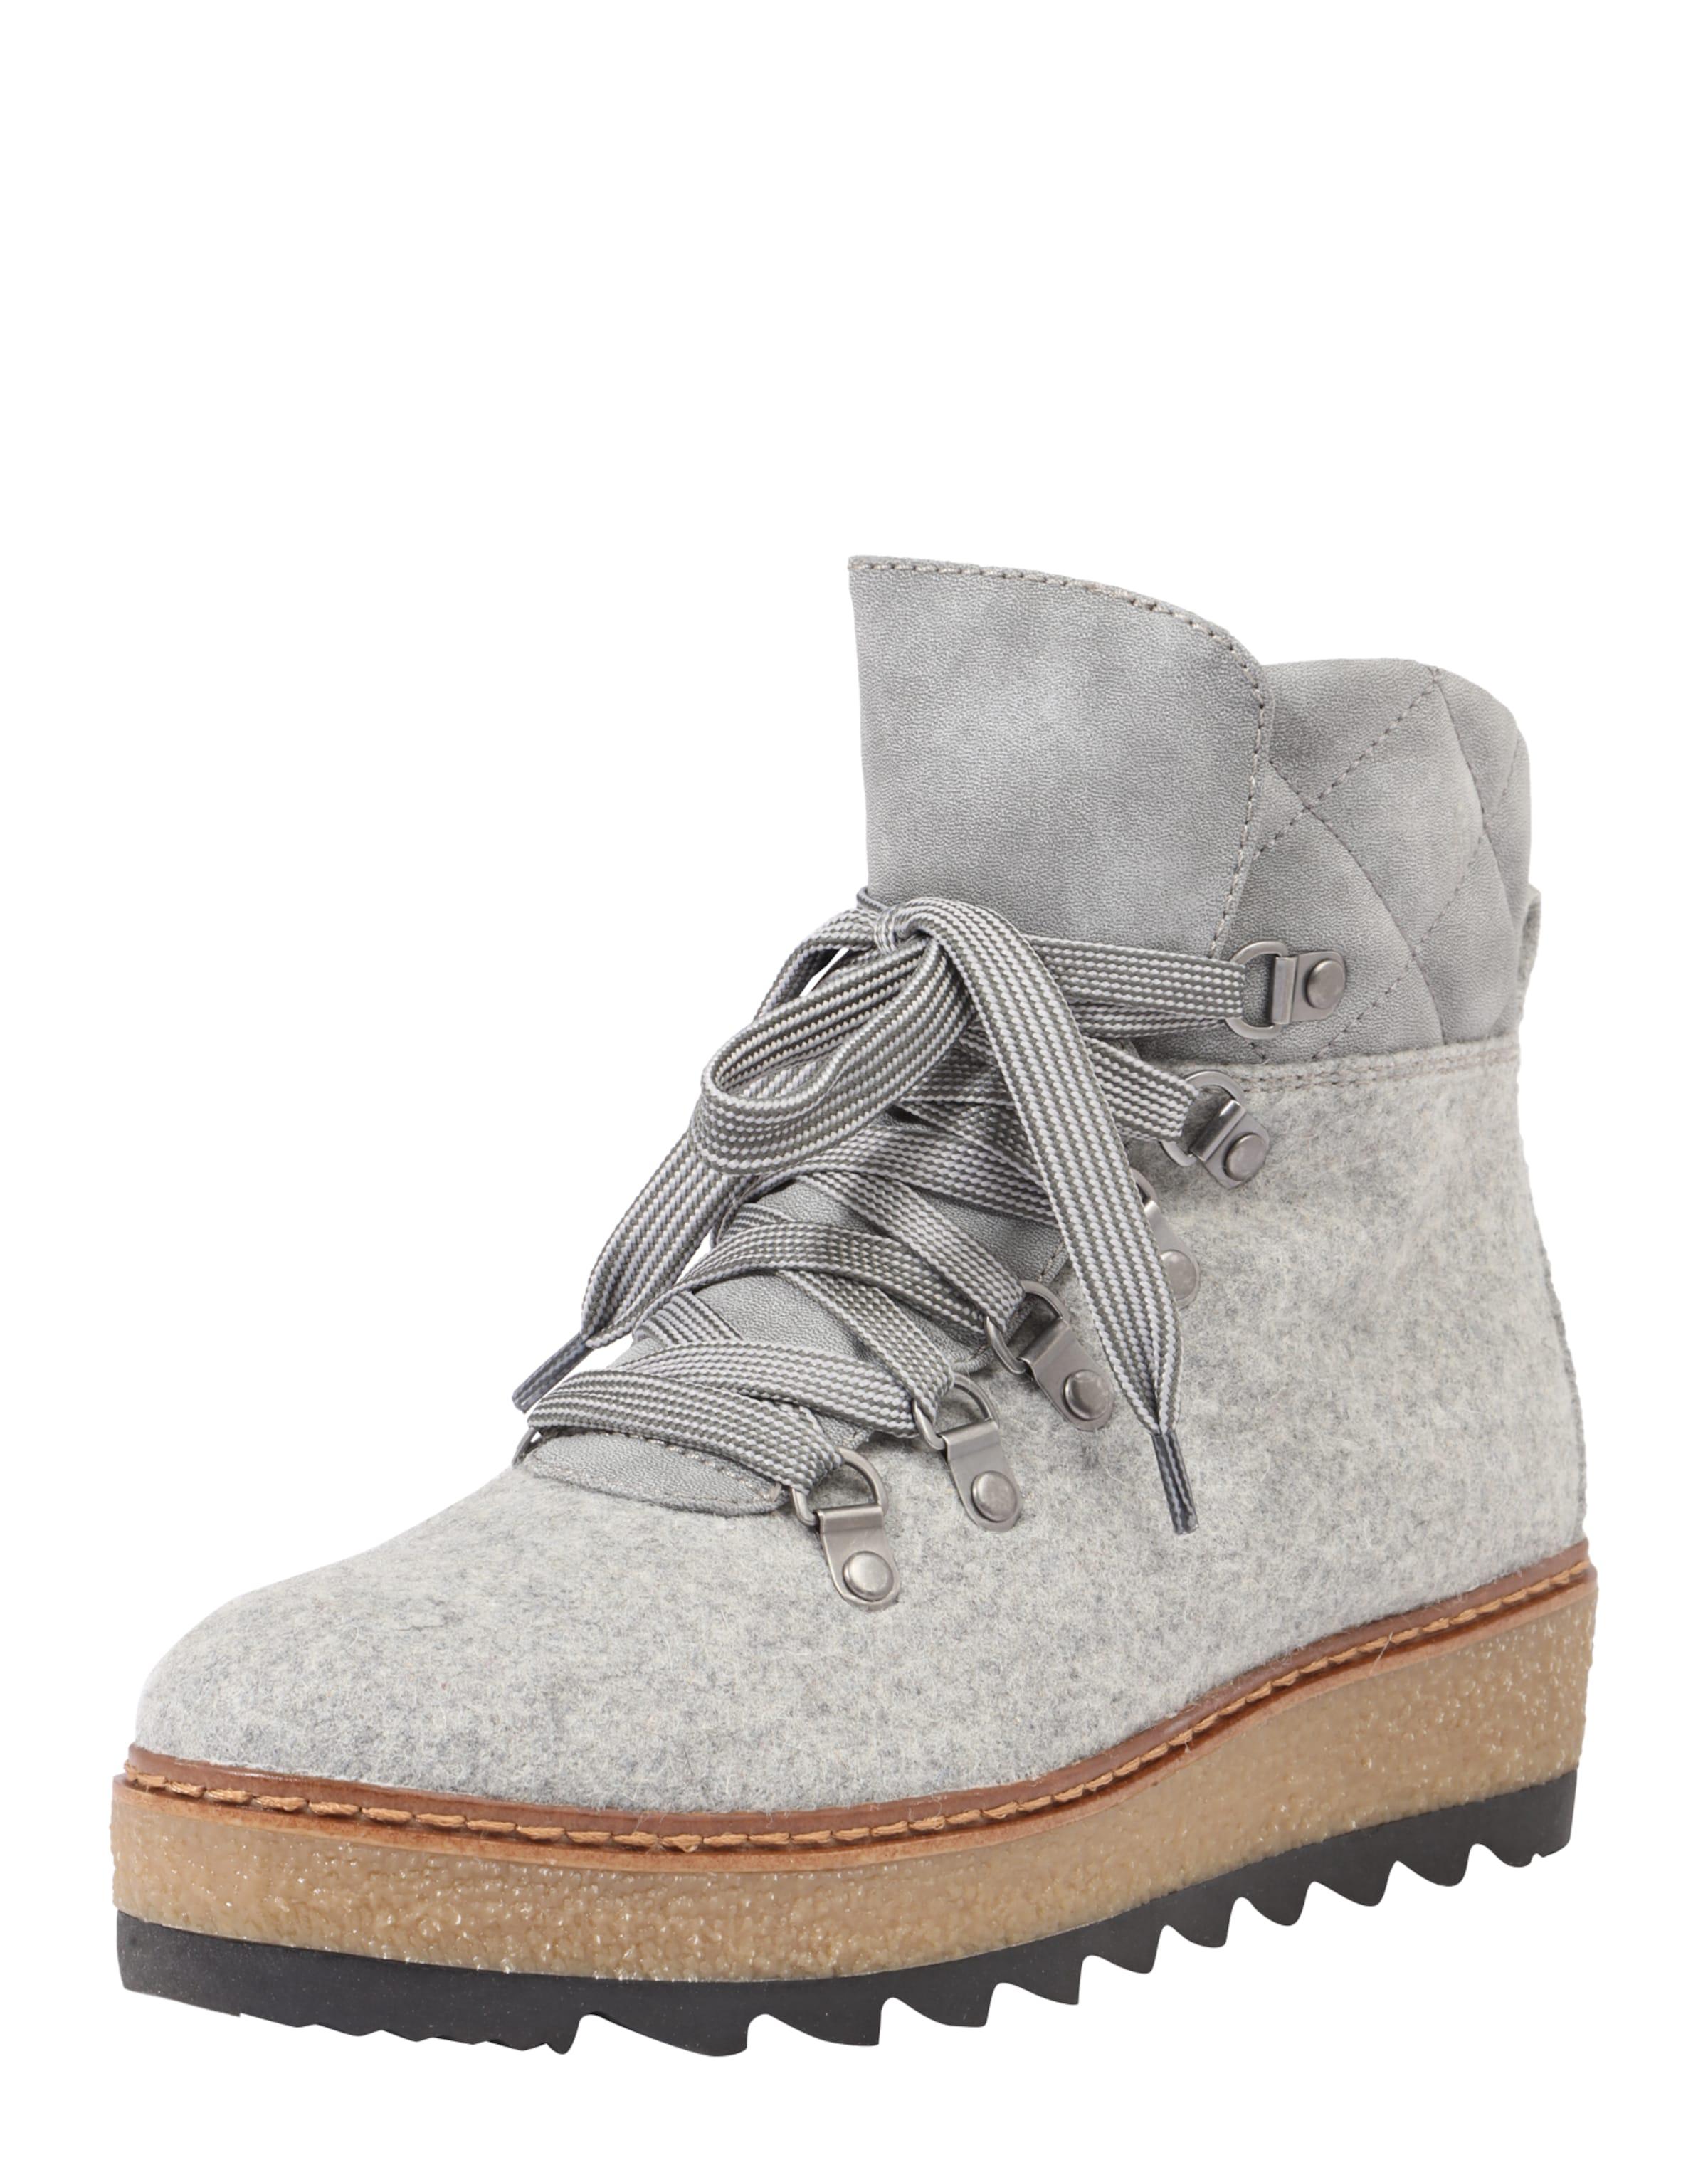 Haltbare Mode billige Schuhe TAMARIS | Plateau-Stiefelette Schuhe Gut getragene Schuhe